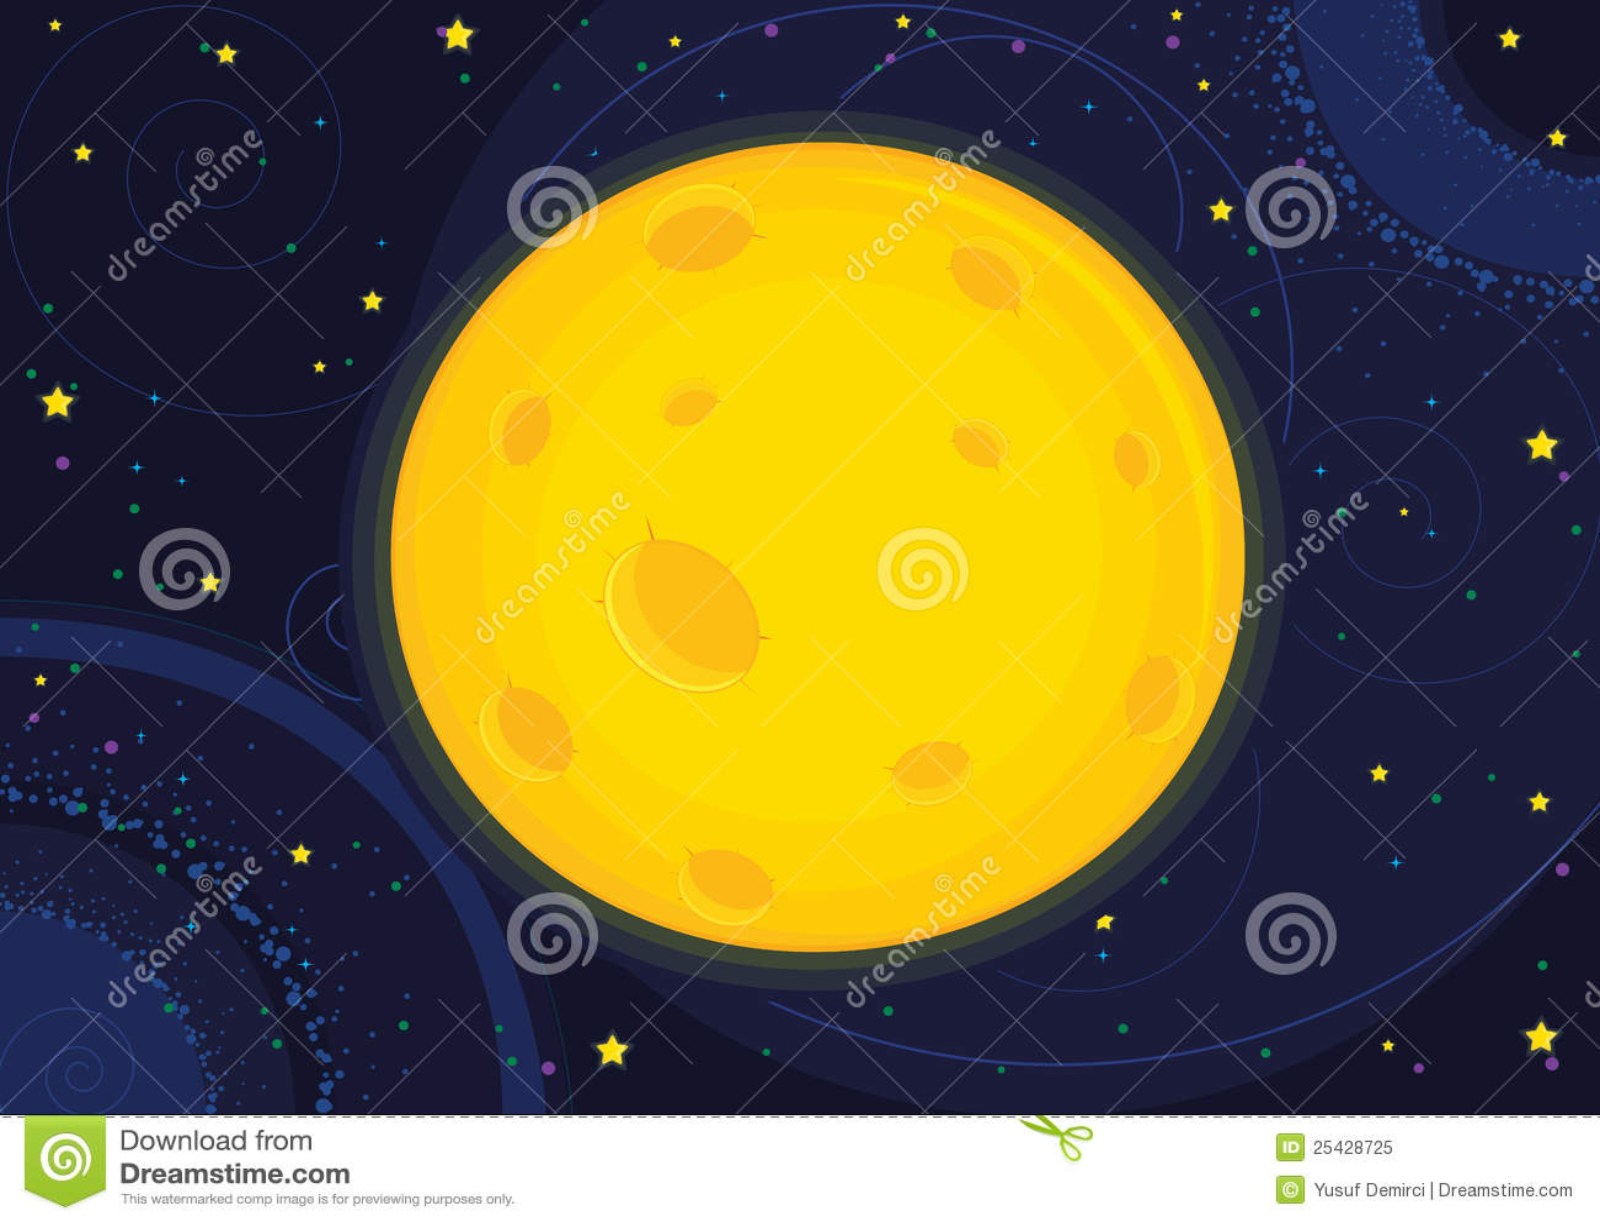 Moon Calendar Illustration : Moon vector illustration royalty free stock photo image